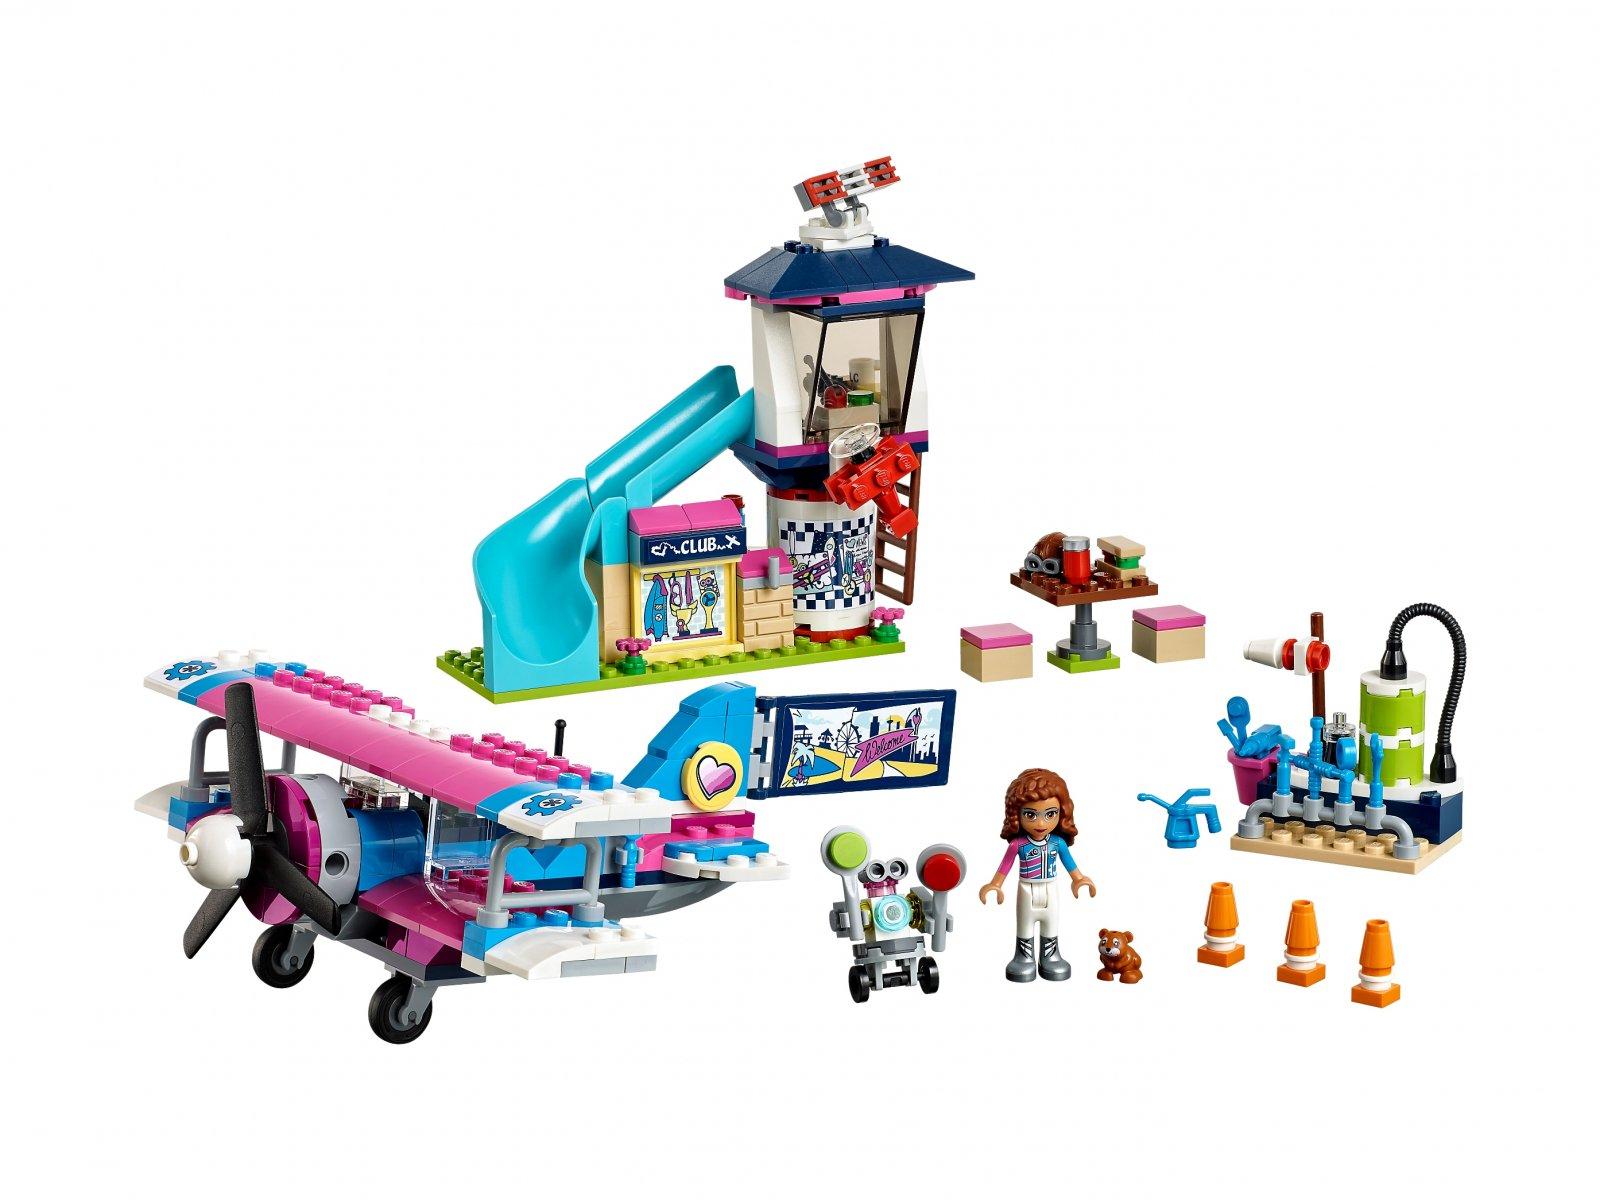 Lego Friends 41343 Lot samolotem nad Miastem Heartlake